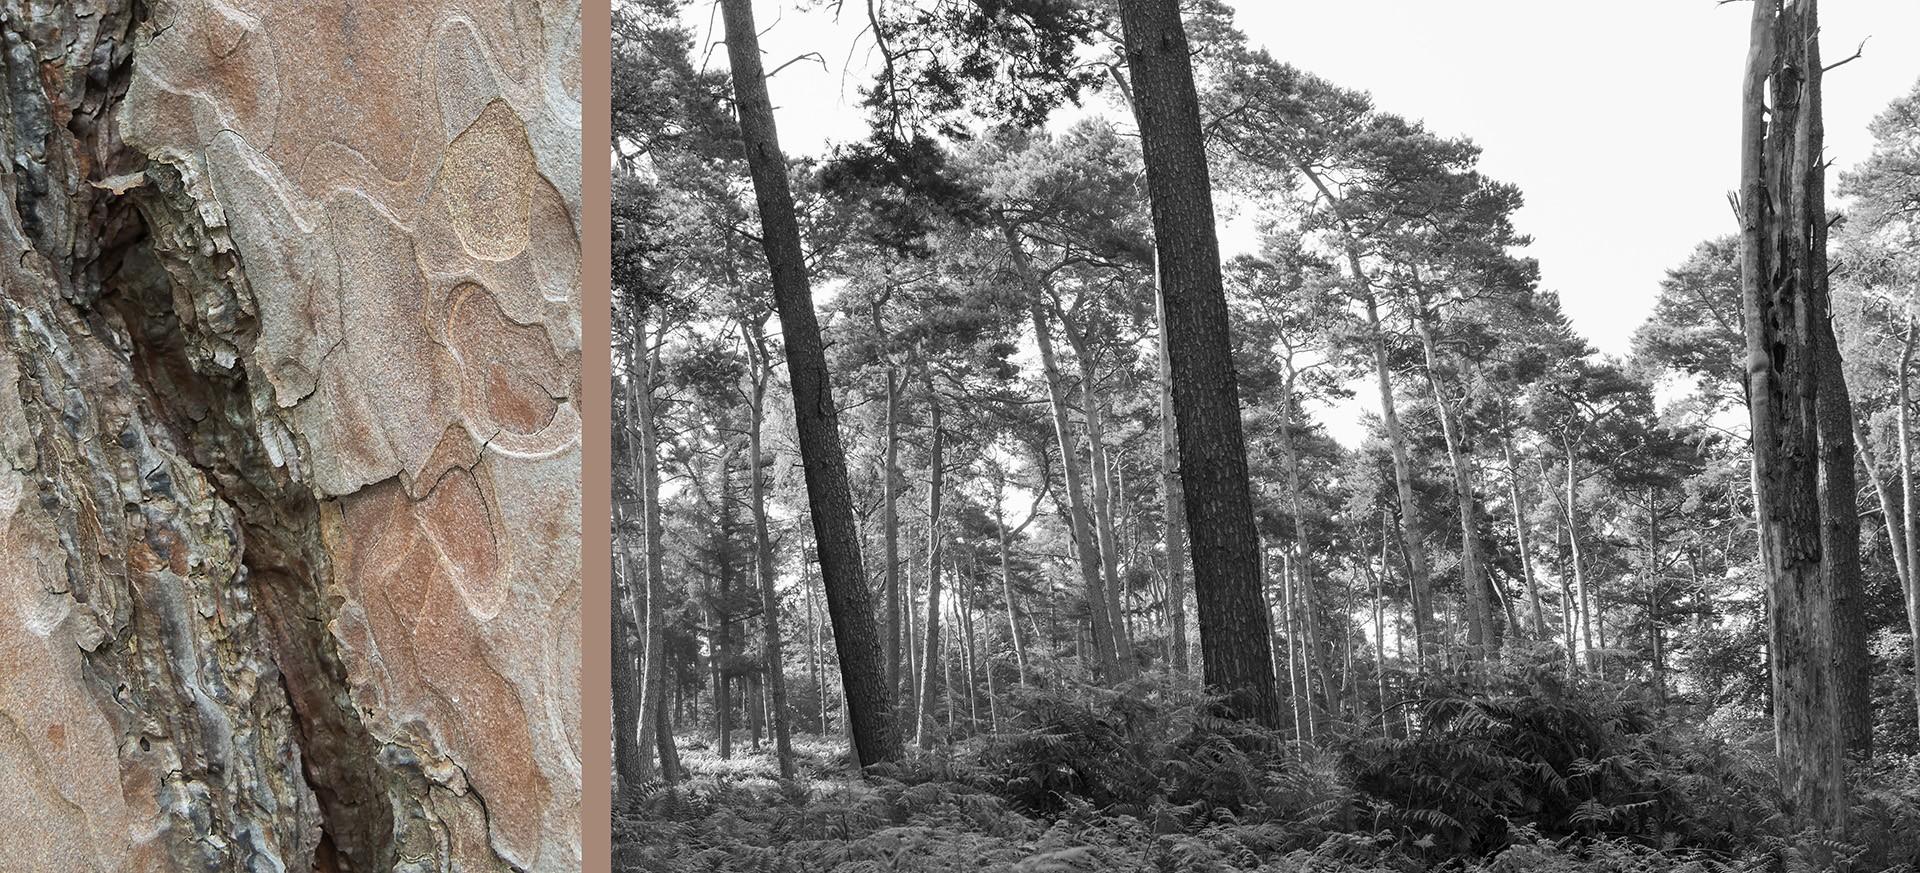 WaldRindenDoppel Kiefern I • Lambda-Print auf KODAK Pro Endura, Alu-Dibond®, 110 x 50 cm, gerahmt als Art-Box • Auflage: 5 + 2 Artist's Proof